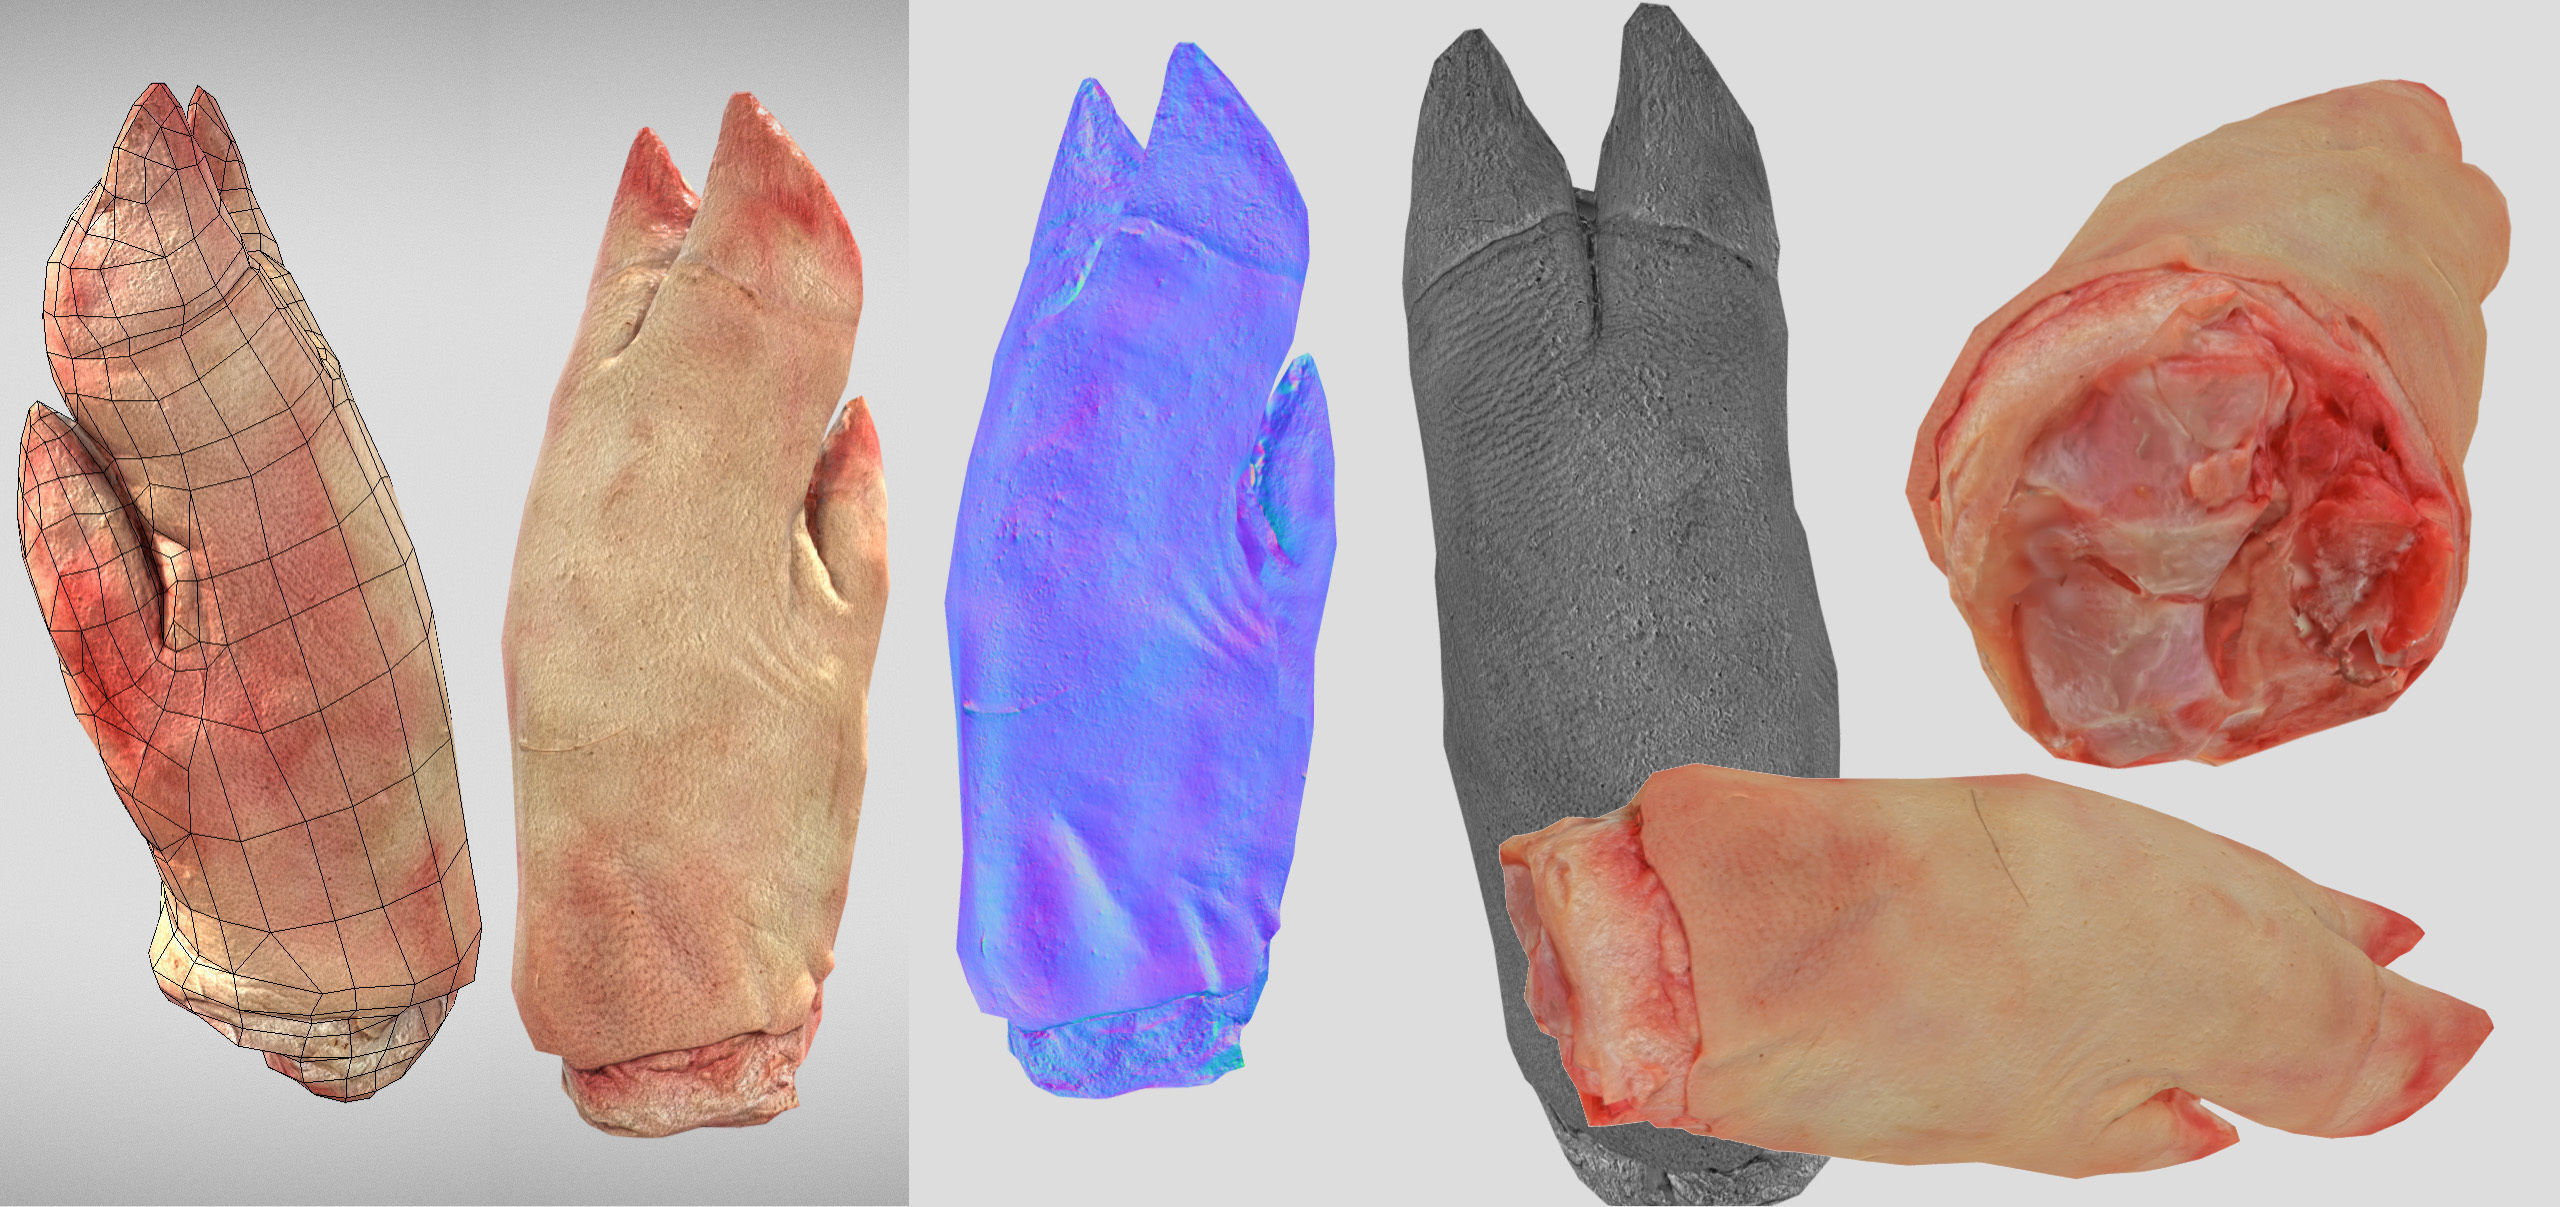 Raw Pigs leg 3D scan